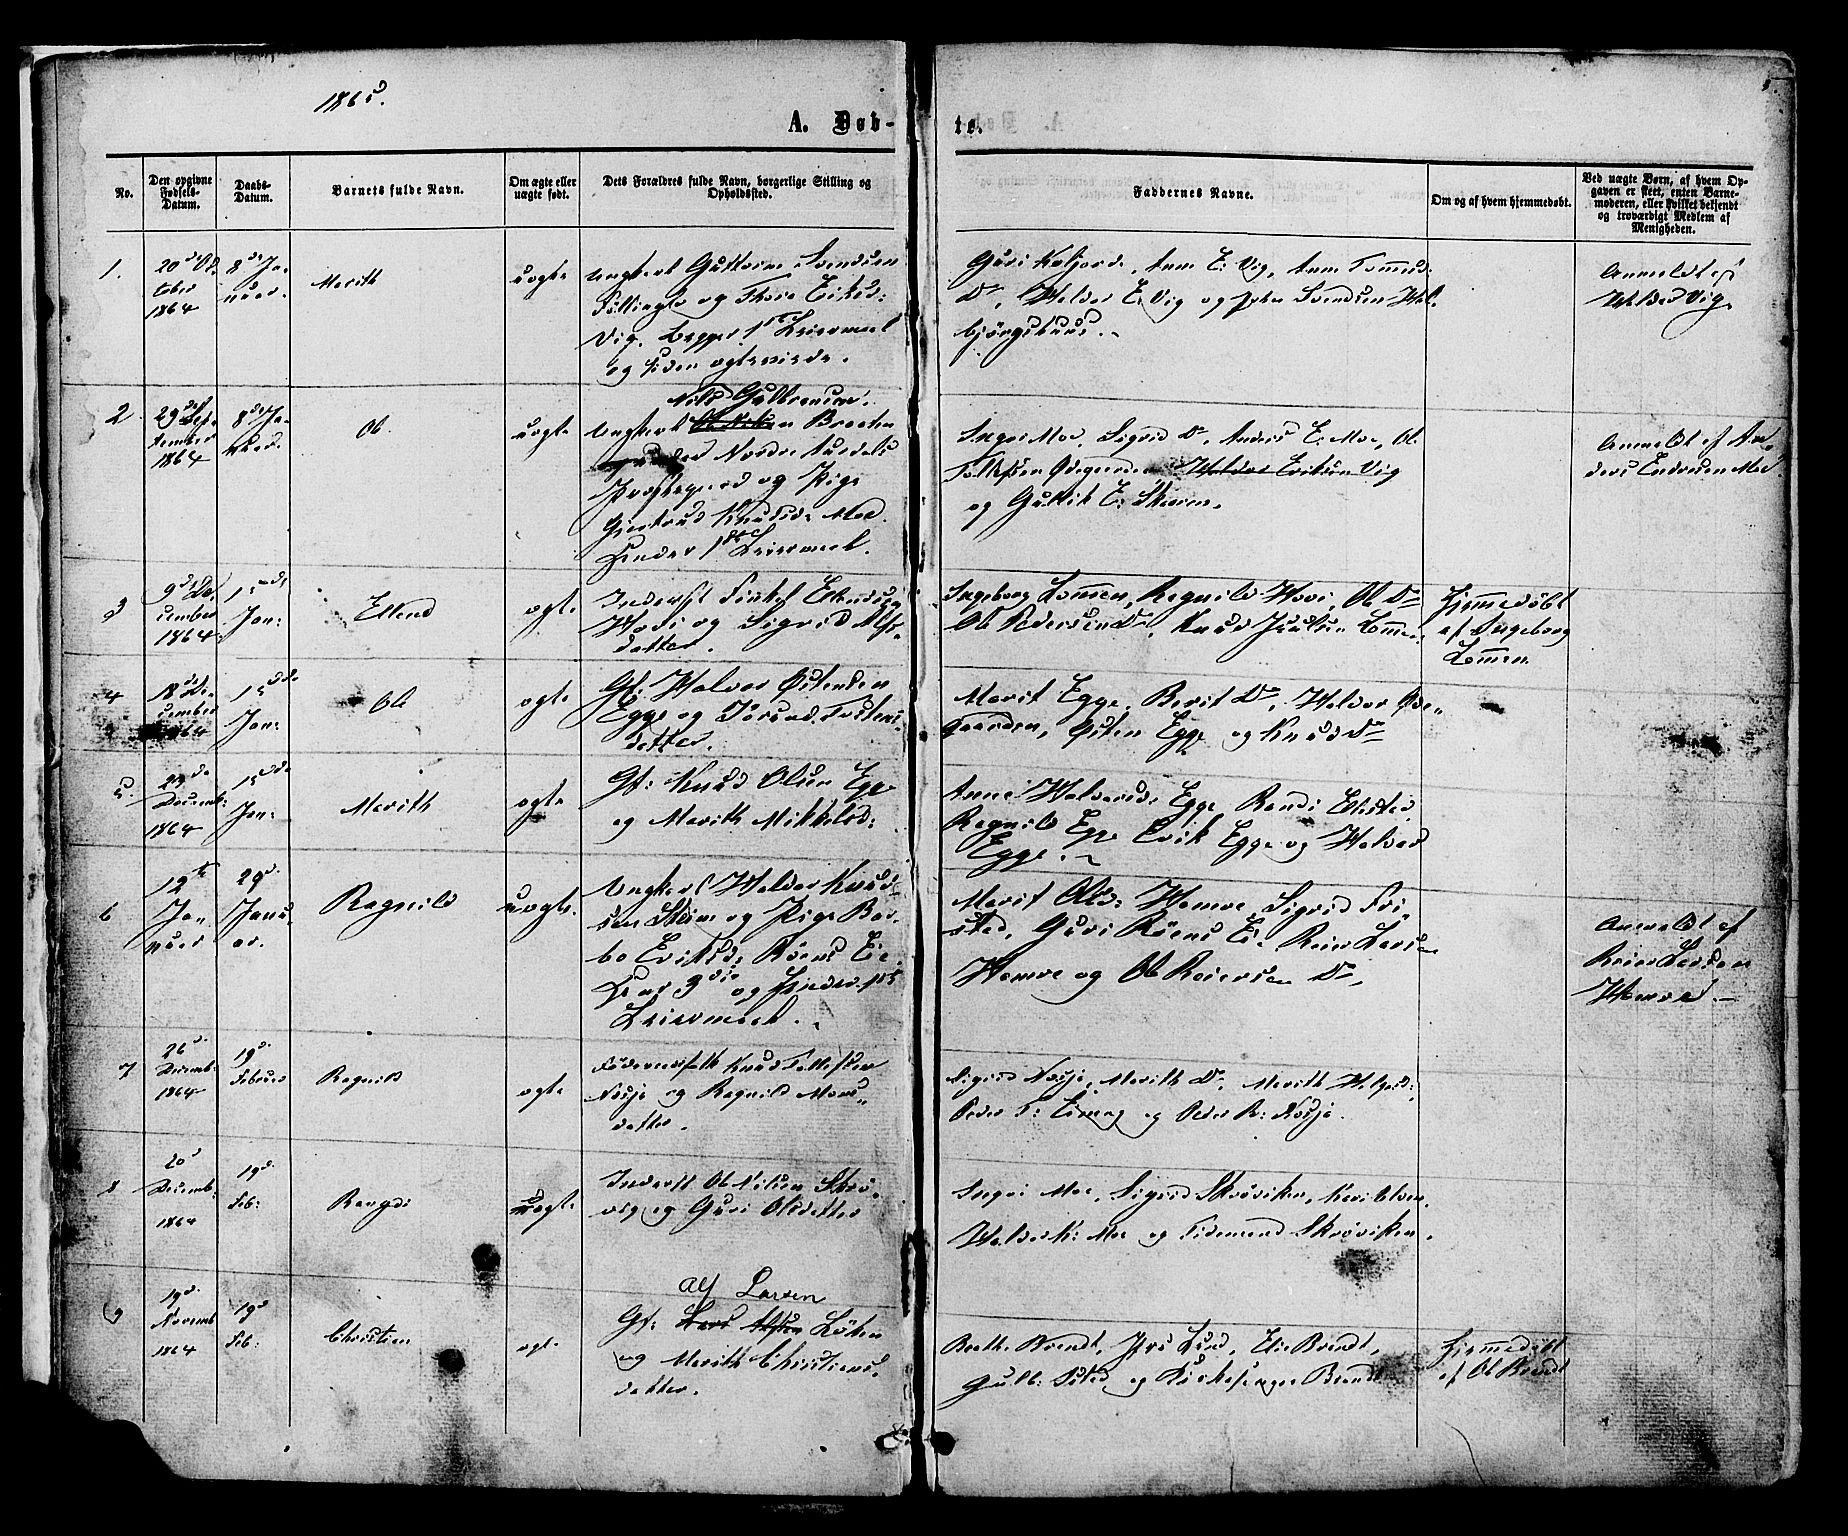 SAH, Vestre Slidre prestekontor, Ministerialbok nr. 3, 1865-1880, s. 5